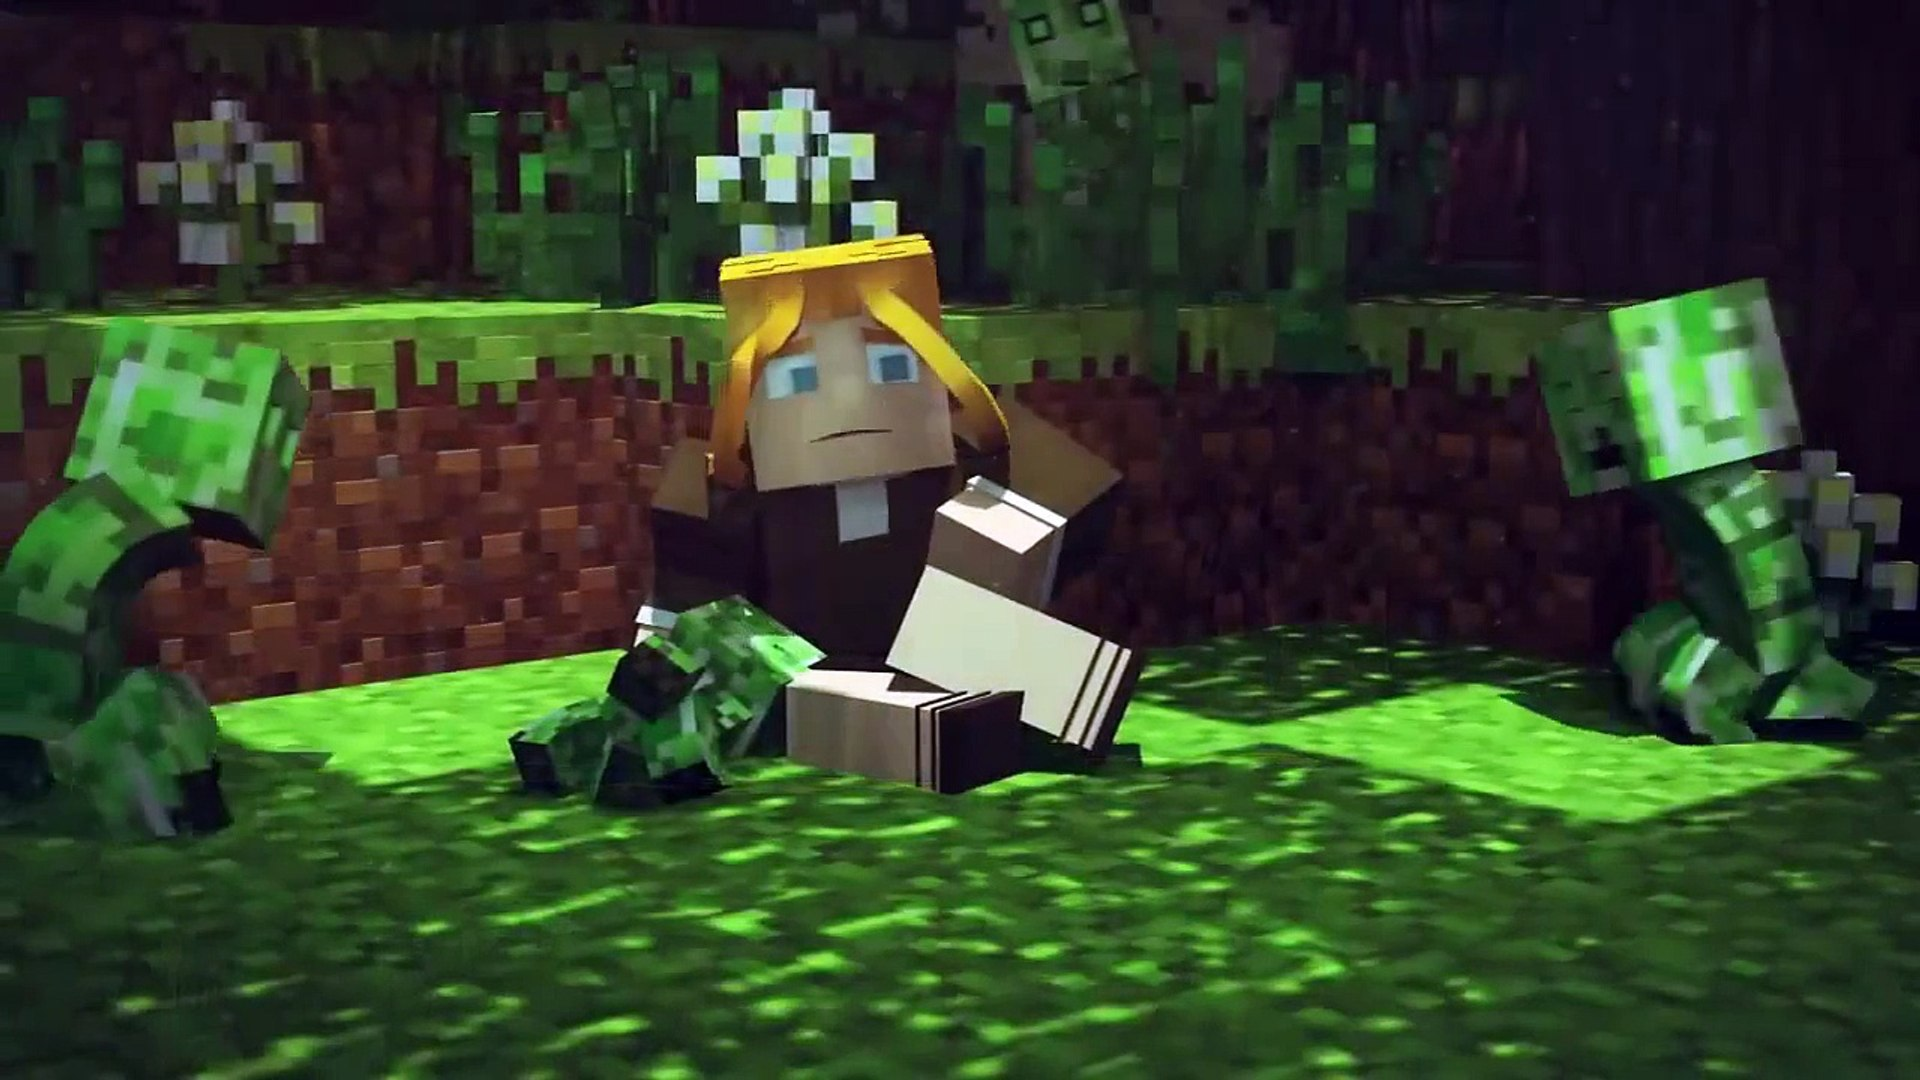 Top 10 Minecraft Song Animation Parody - Minecraft Songs Animations Parodies June 2015